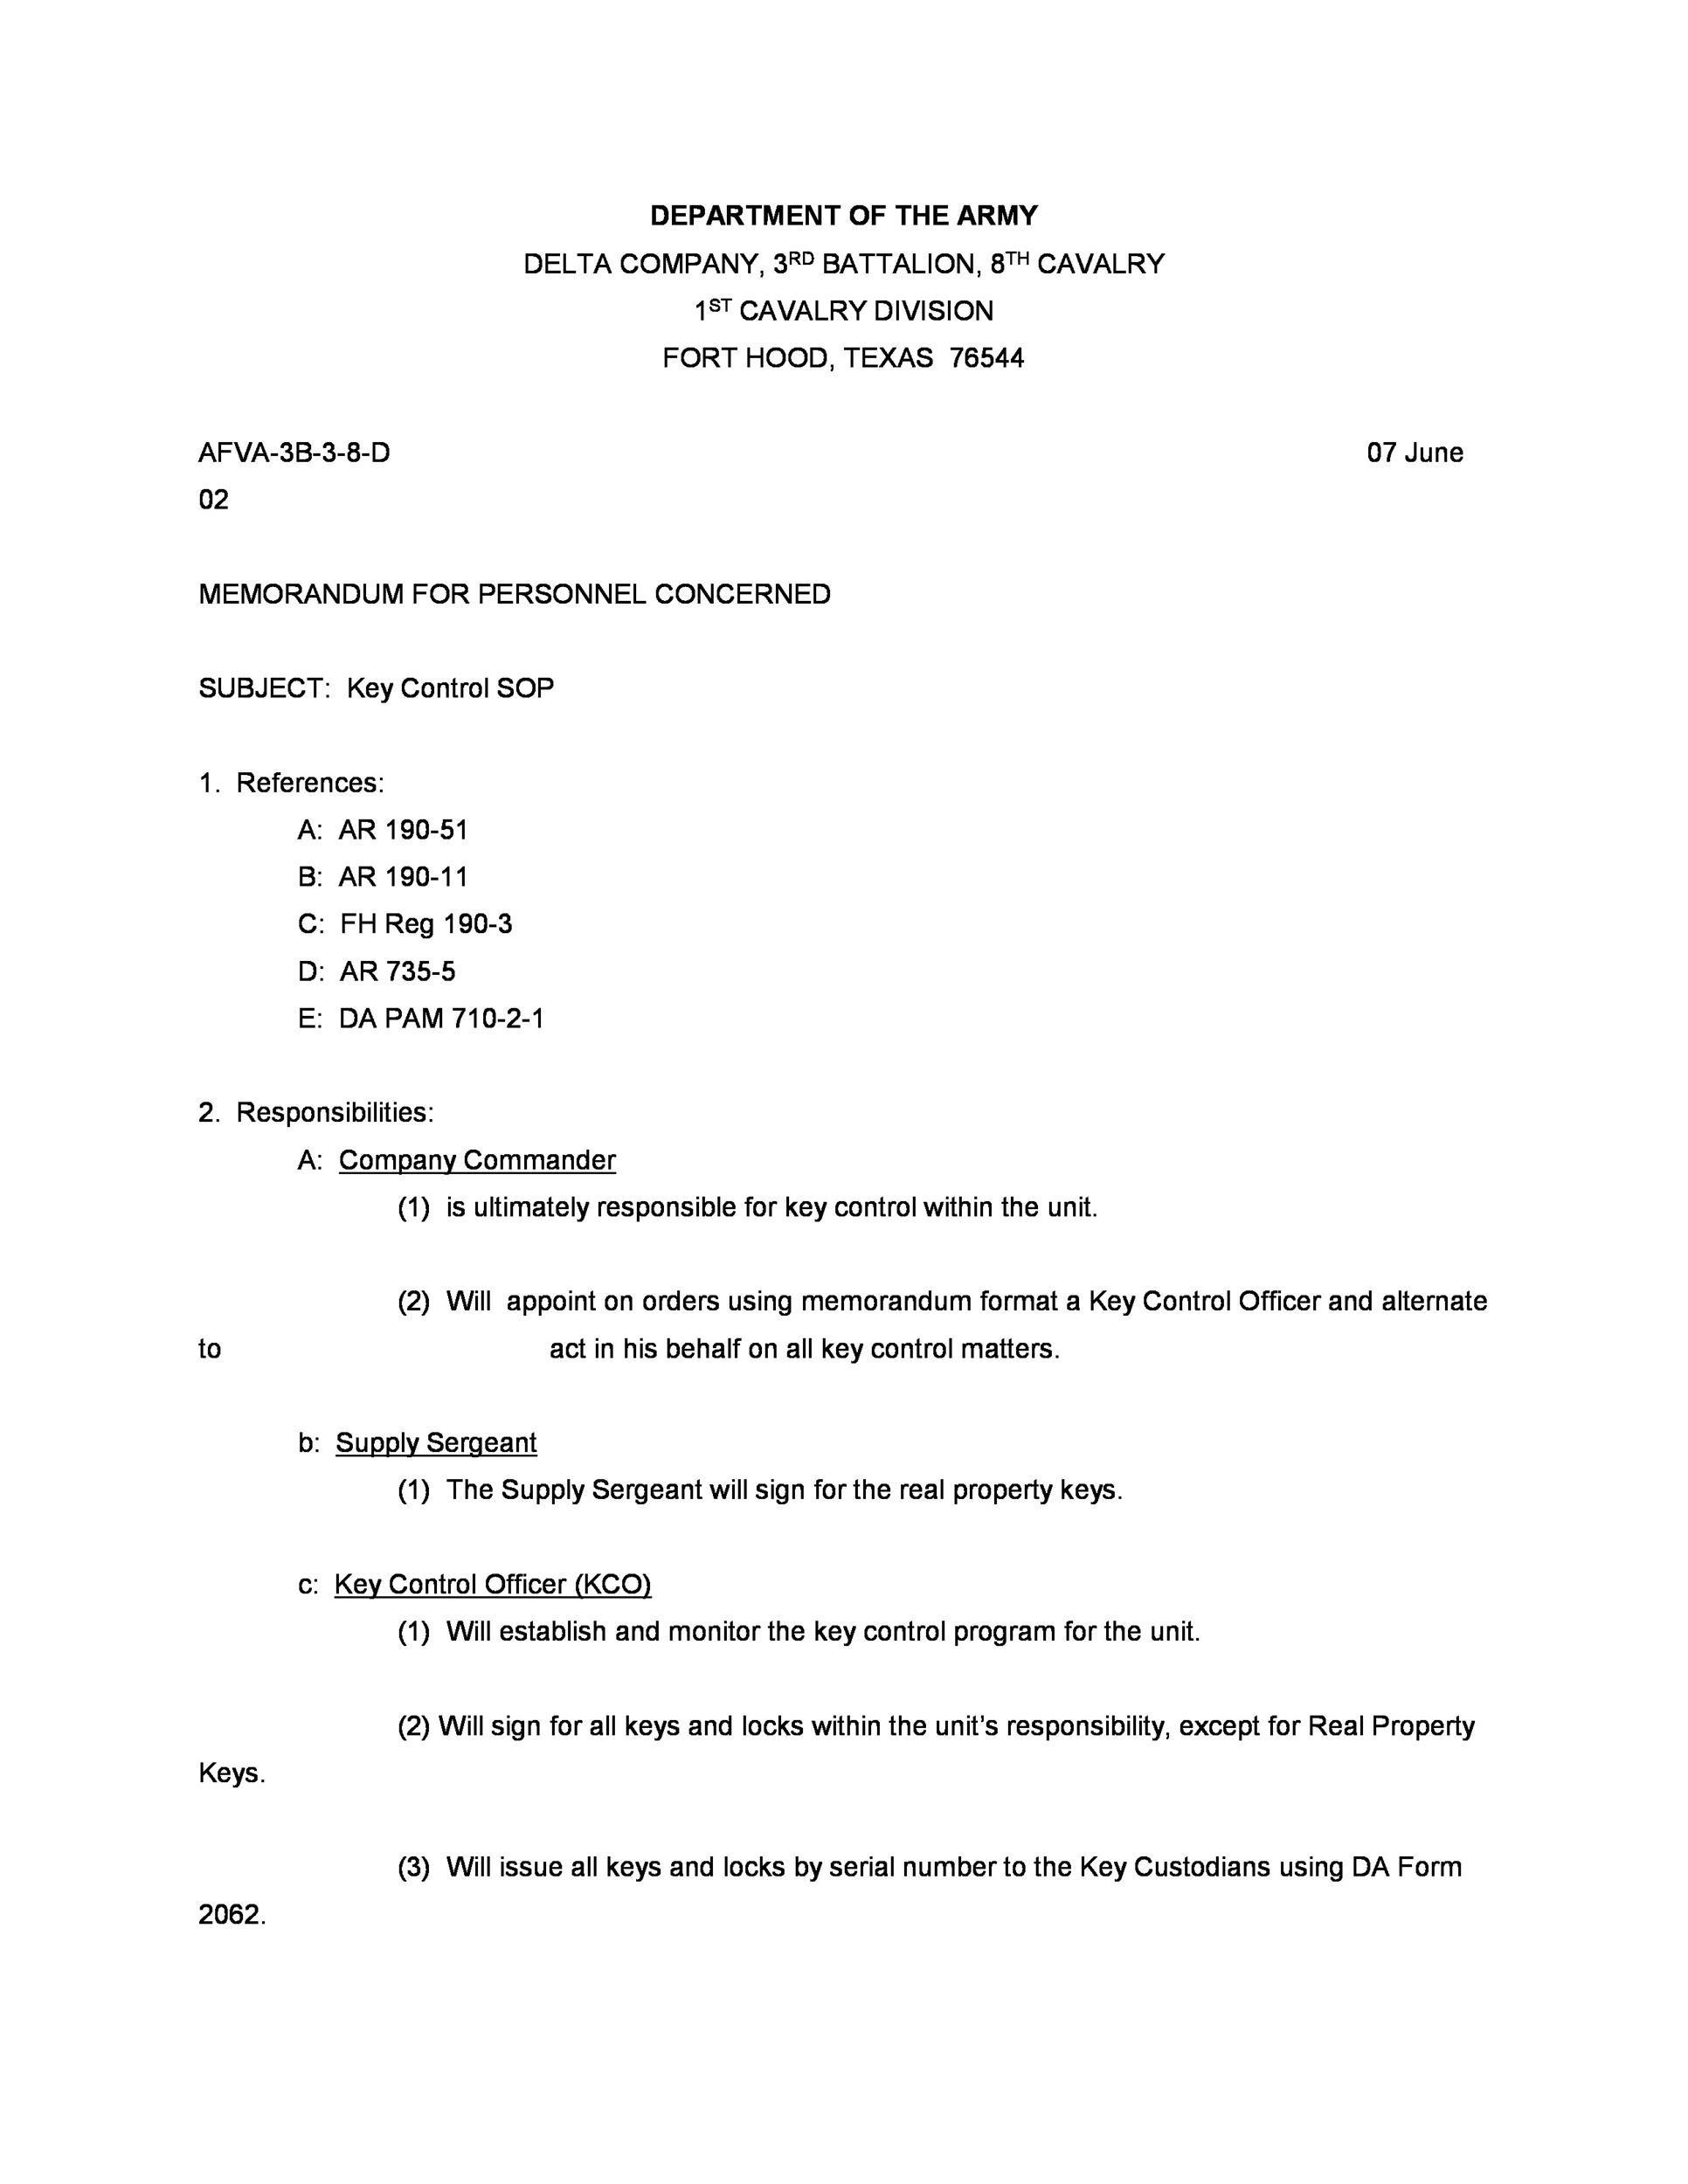 Free private placement memorandum template 40